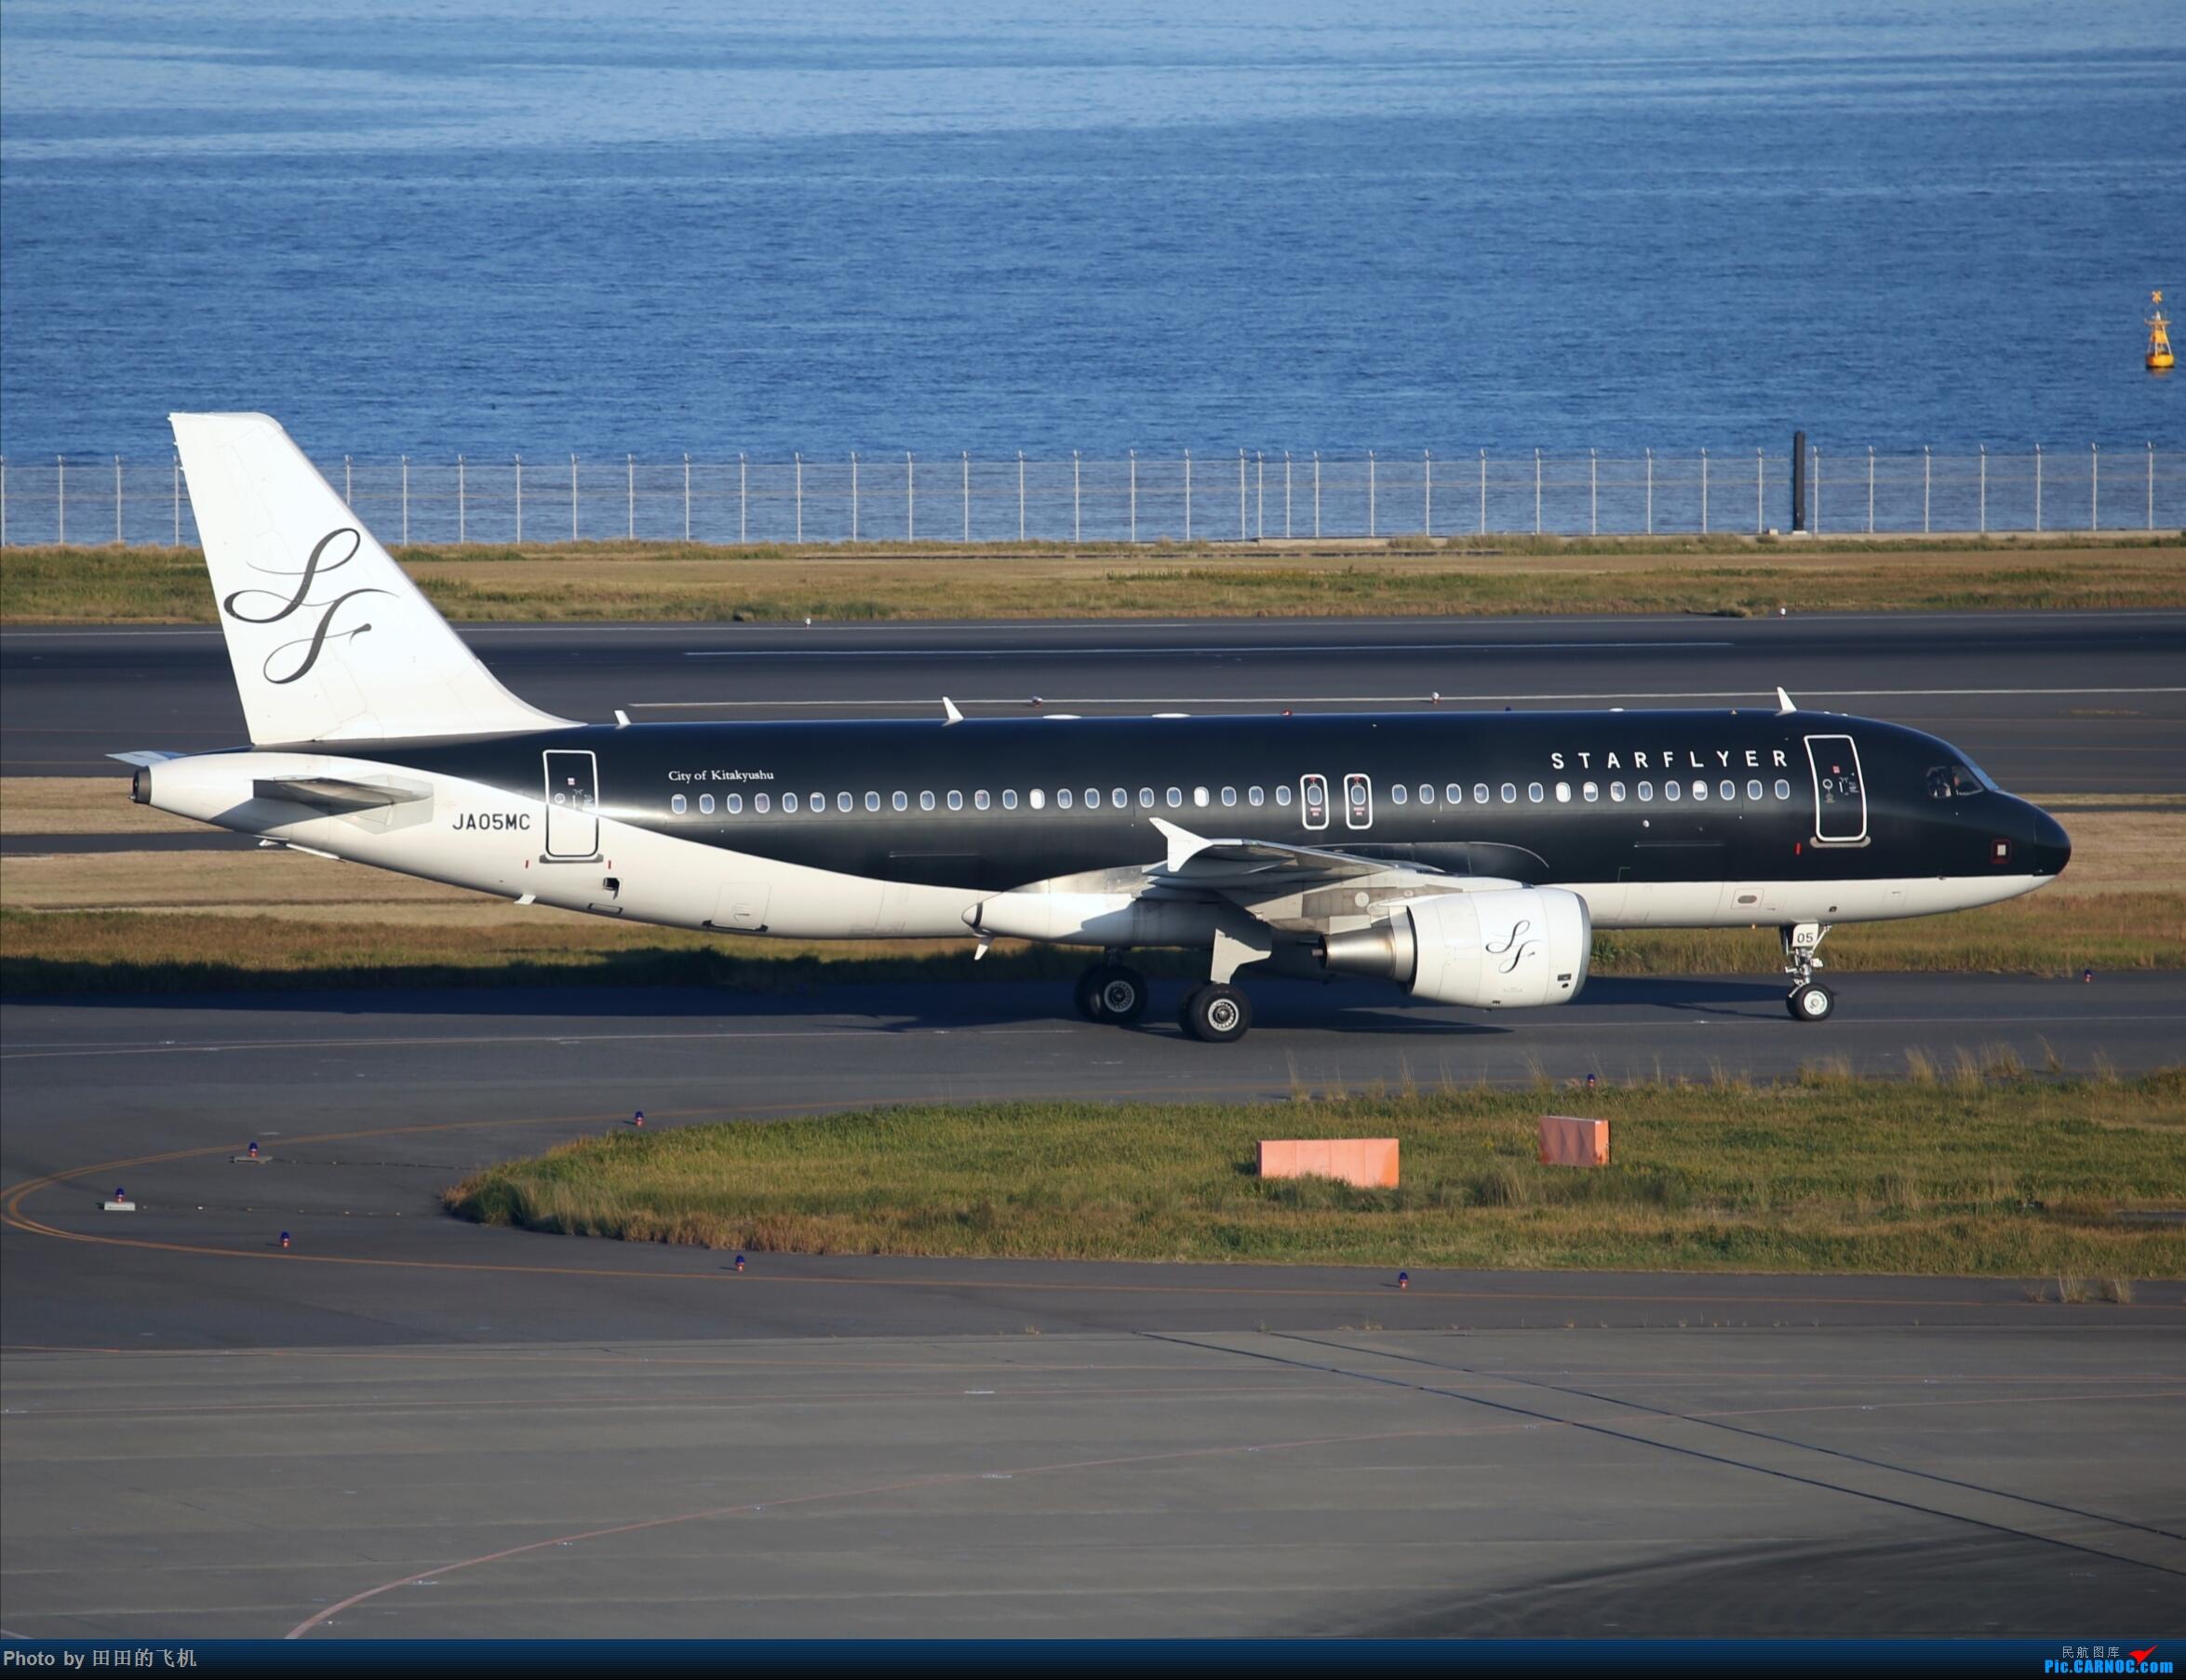 Re:[原创]整理一下去年东京羽田机场拍的飞机 A320 JA05MC 东京羽田机场